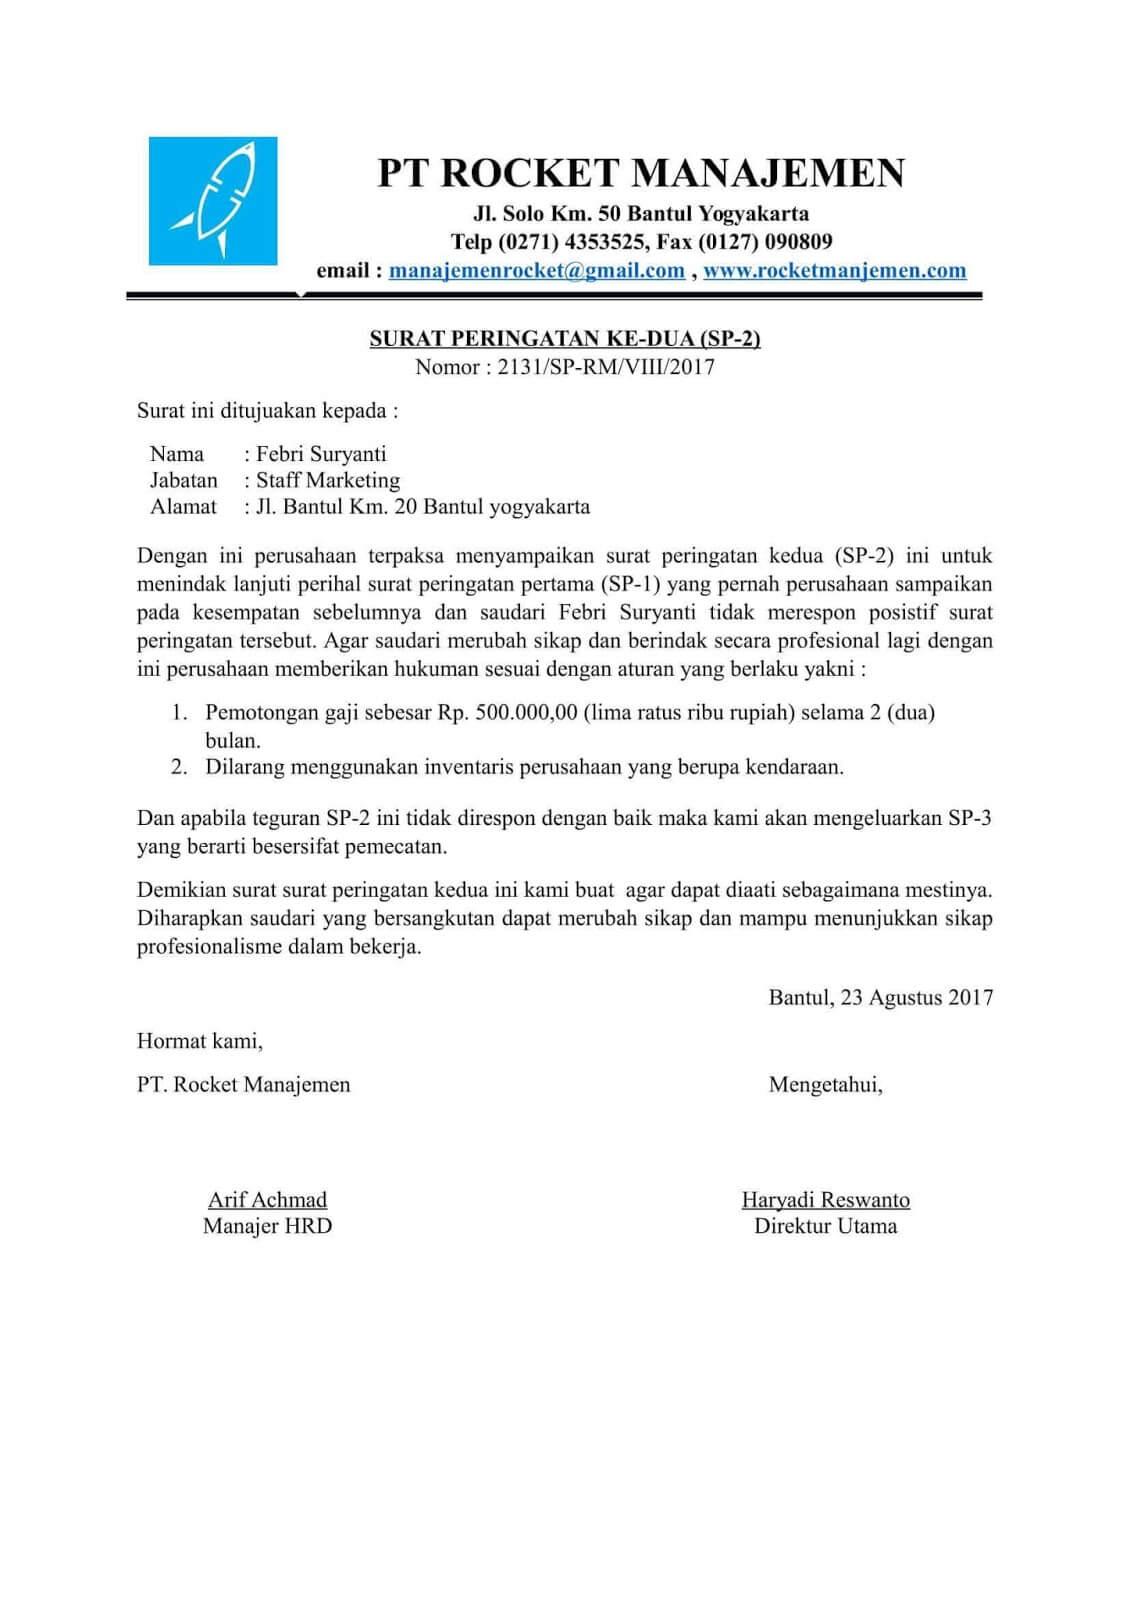 Contoh Surat Pernyataan Pelanggaran Karyawan